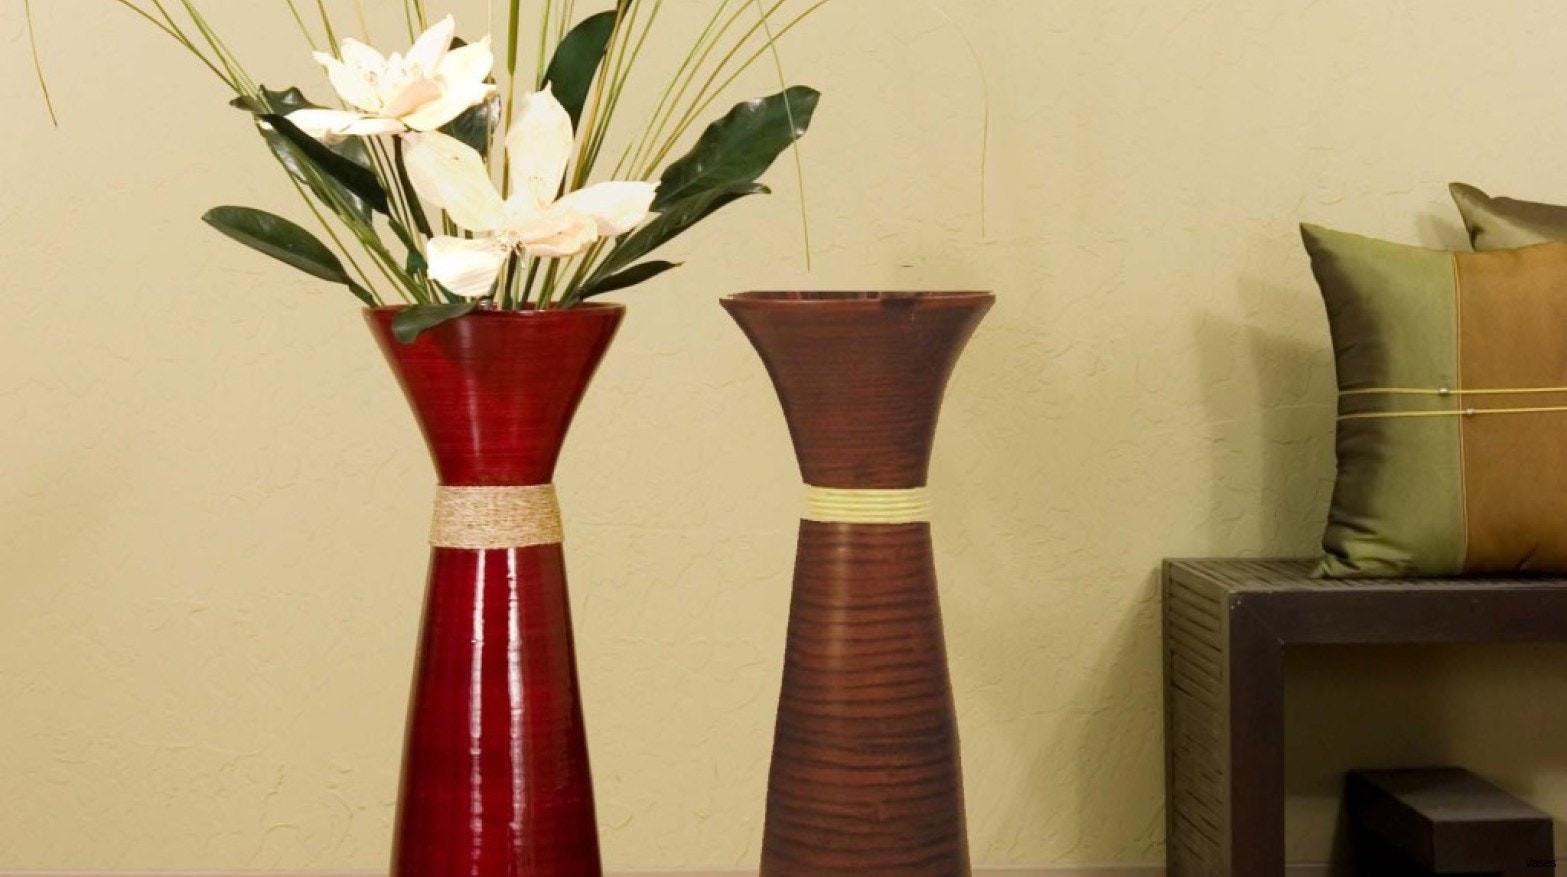 farmhouse glass vase of floor vase decoration themes new vaseplant blume2h vases vase plant for floor vase decoration themes best of 34 inspirational floor plants of floor vase decoration themes new